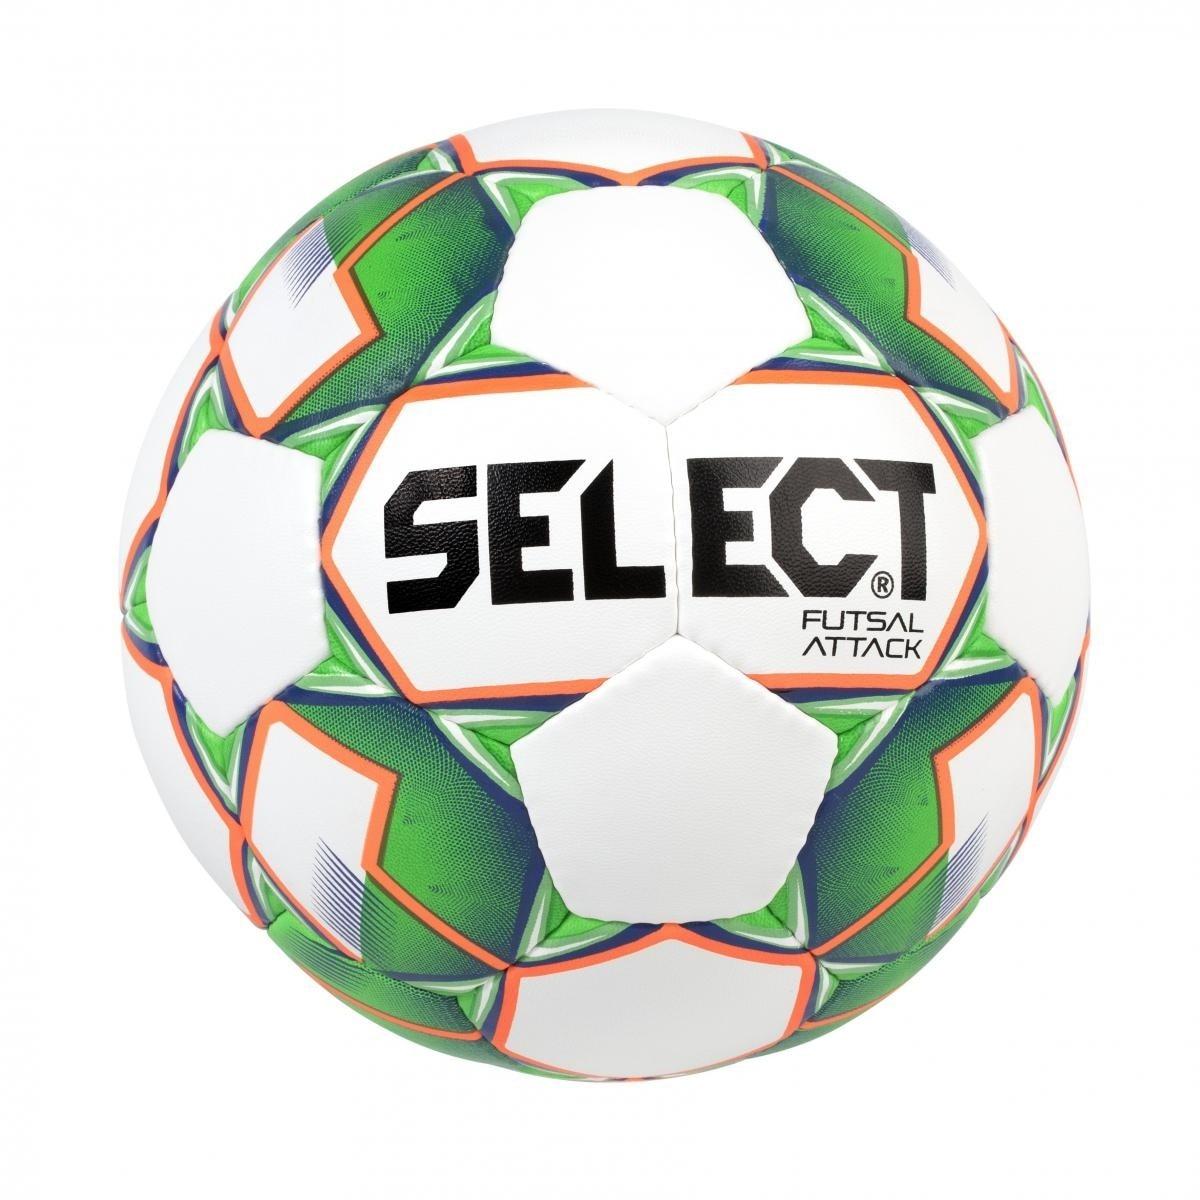 Select Futsal Attack Grain Fotball